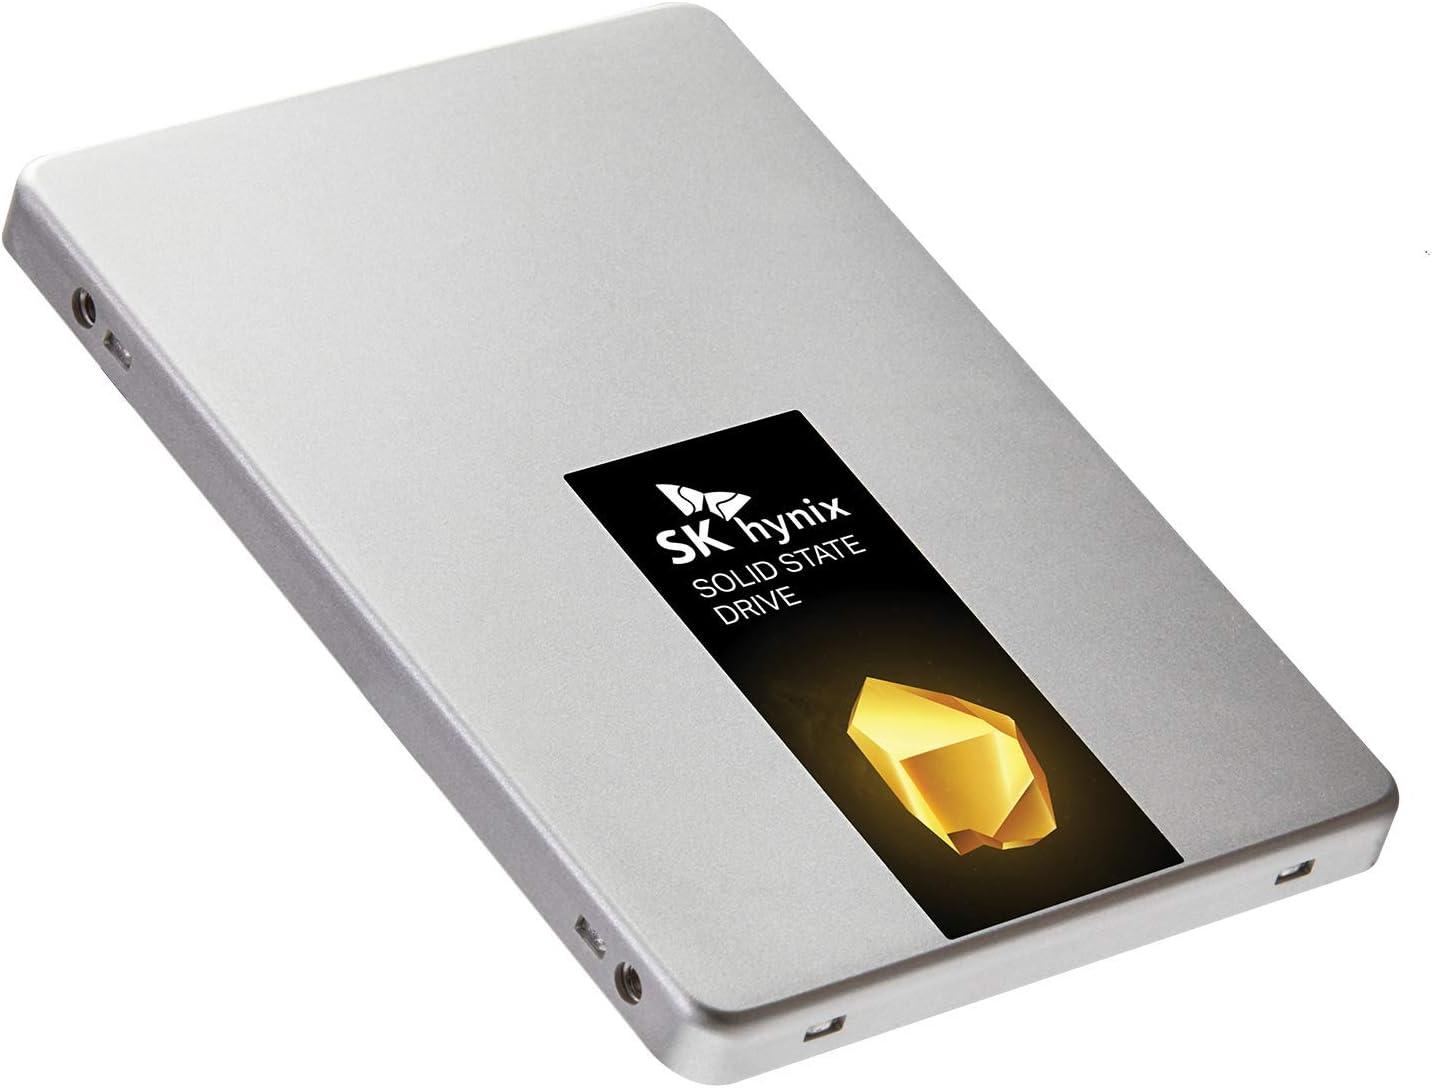 SK hynix Gold S31 500GB 3D NAND 2.5 inch SATA III Internal SSD